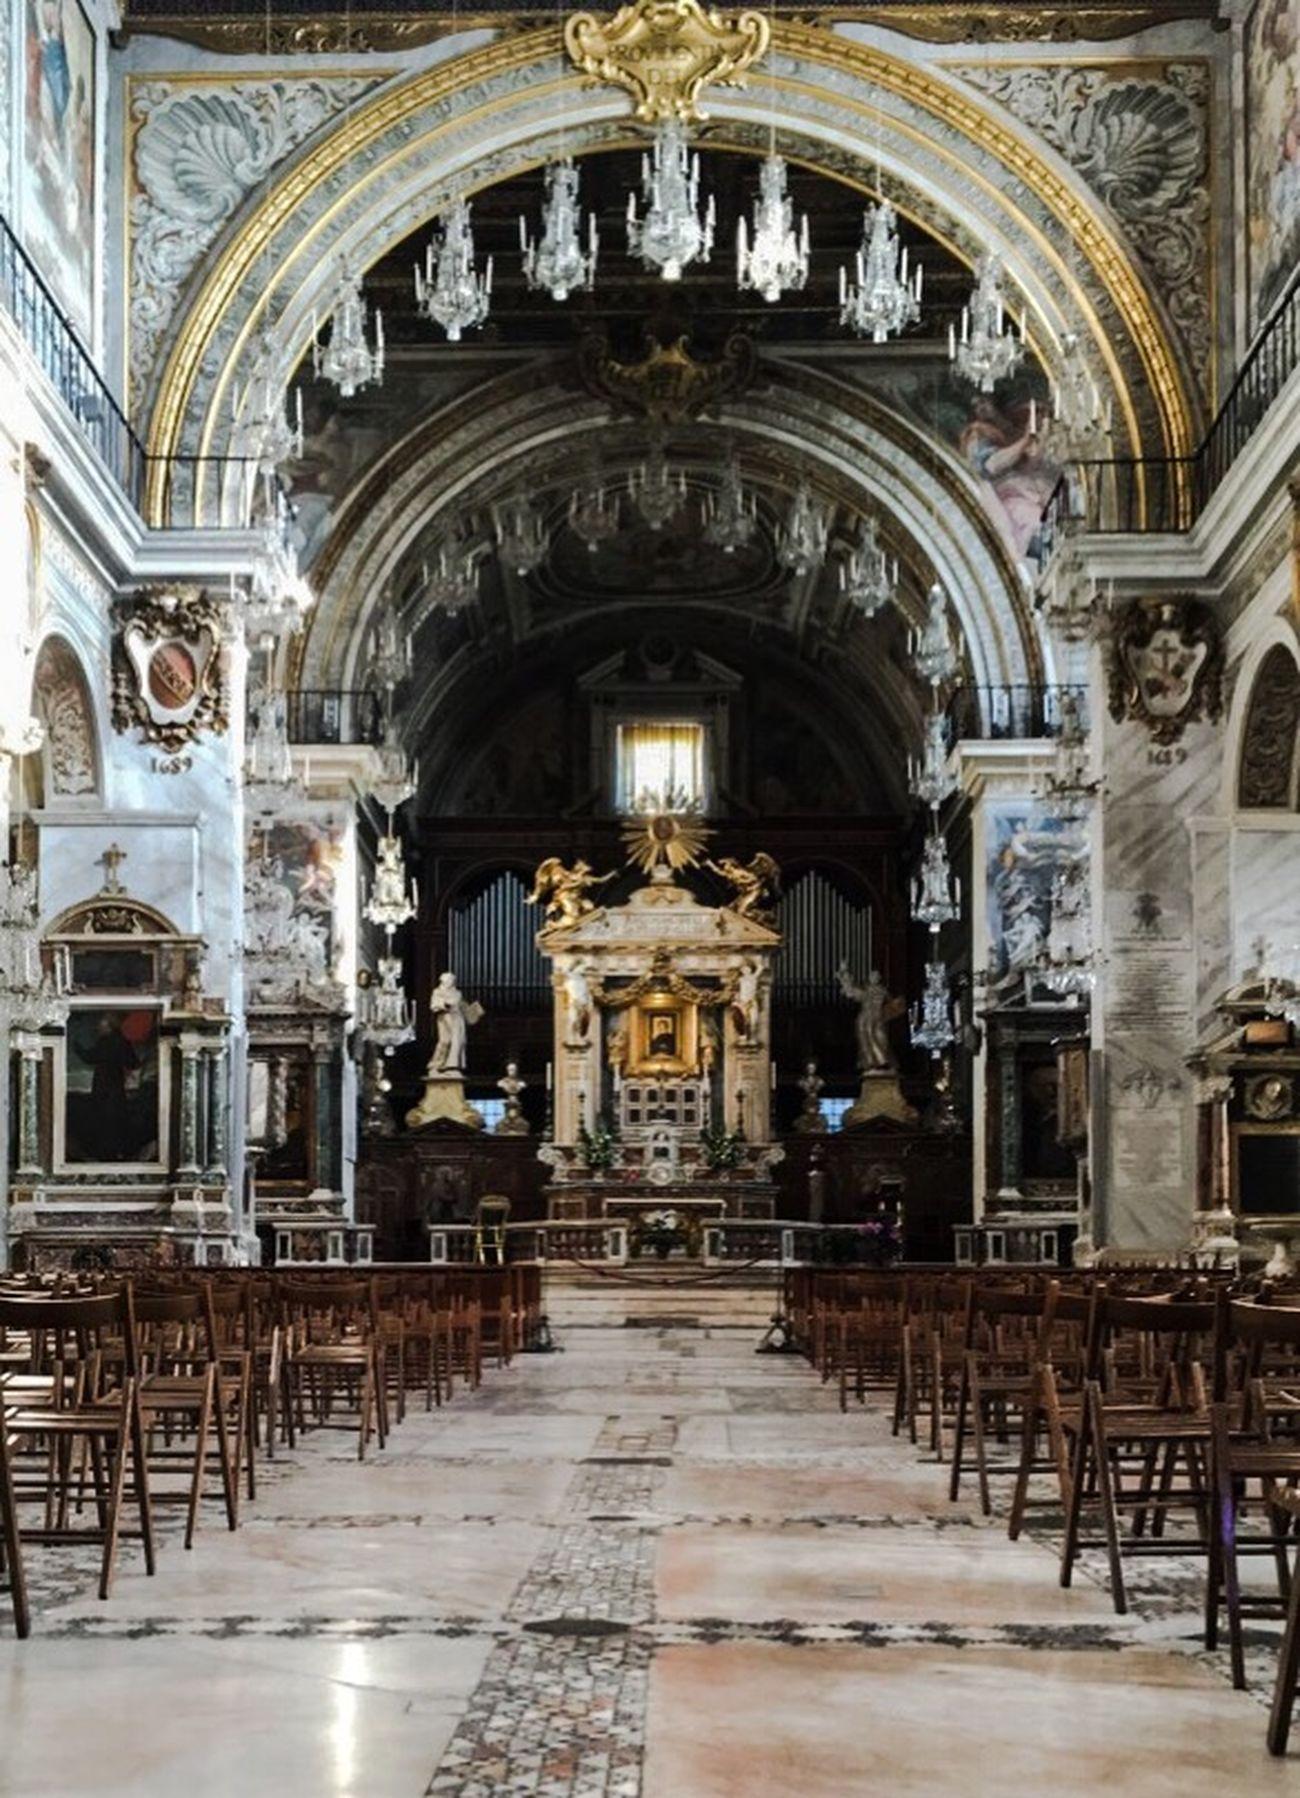 Religion Spirituality Architecture History Arch City No People Eglise Rome Italy Santuary Silence Religious Architecture Religion And Tradition Architectural Detail Architecture